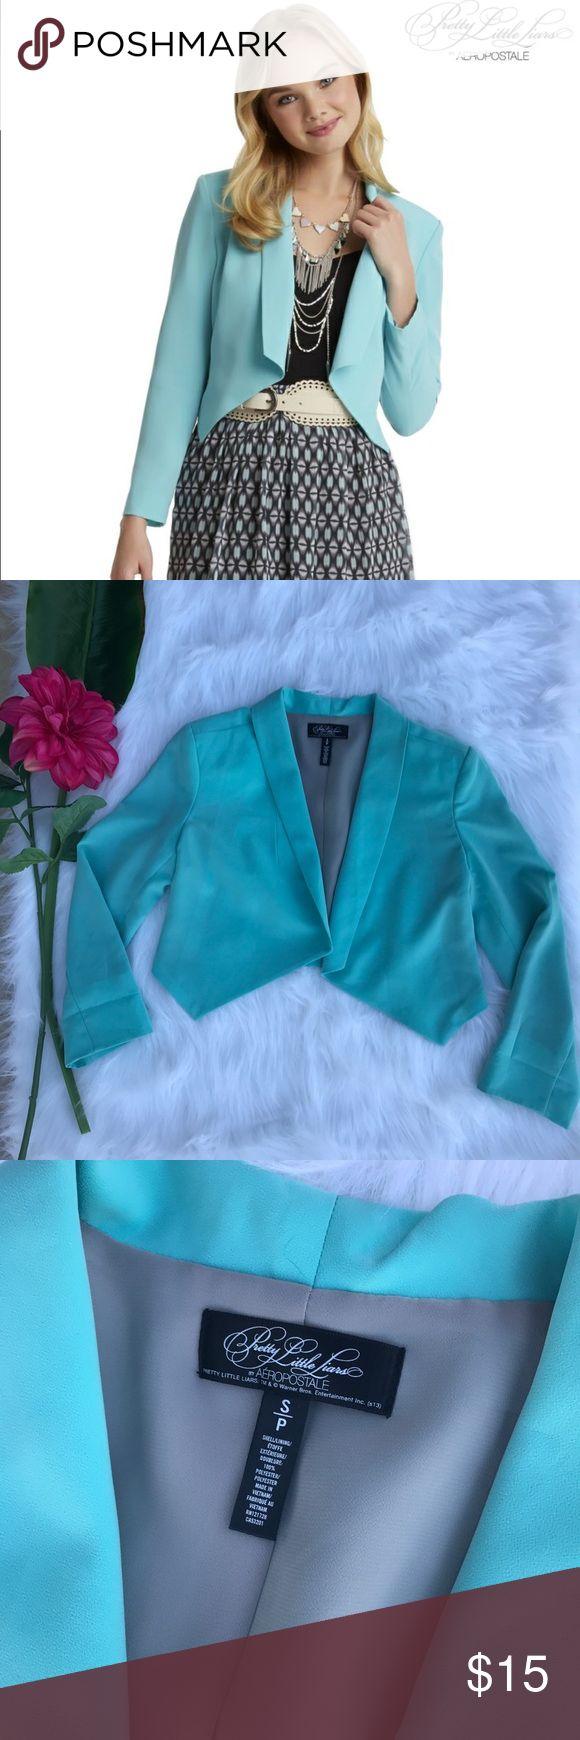 Pretty Little Liars by Aeropostale (Blazer) SMOKE FREE PET FREE HOME Aeropostale Jackets & Coats Blazers